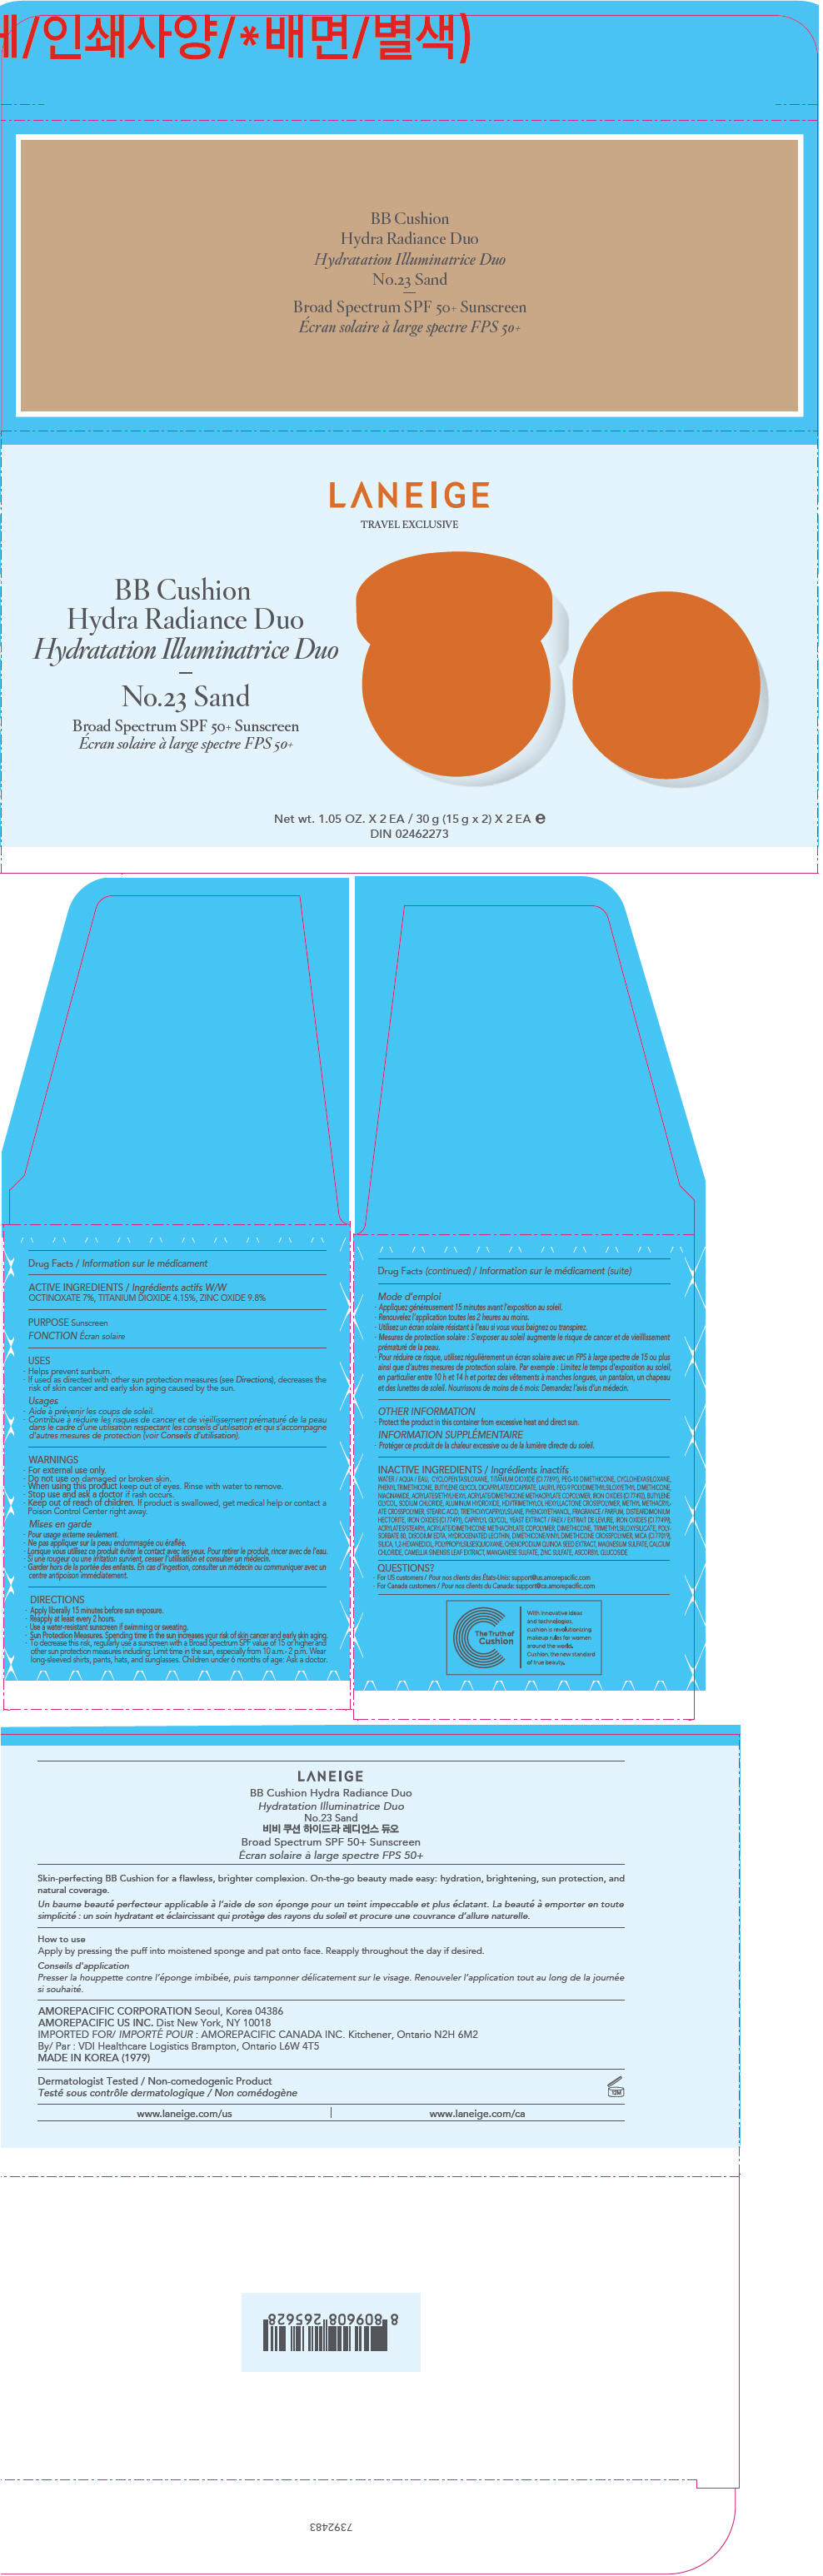 PRINCIPAL DISPLAY PANEL - x 2 (15 g x 2 Container Carton) Carton - No.23 Sand